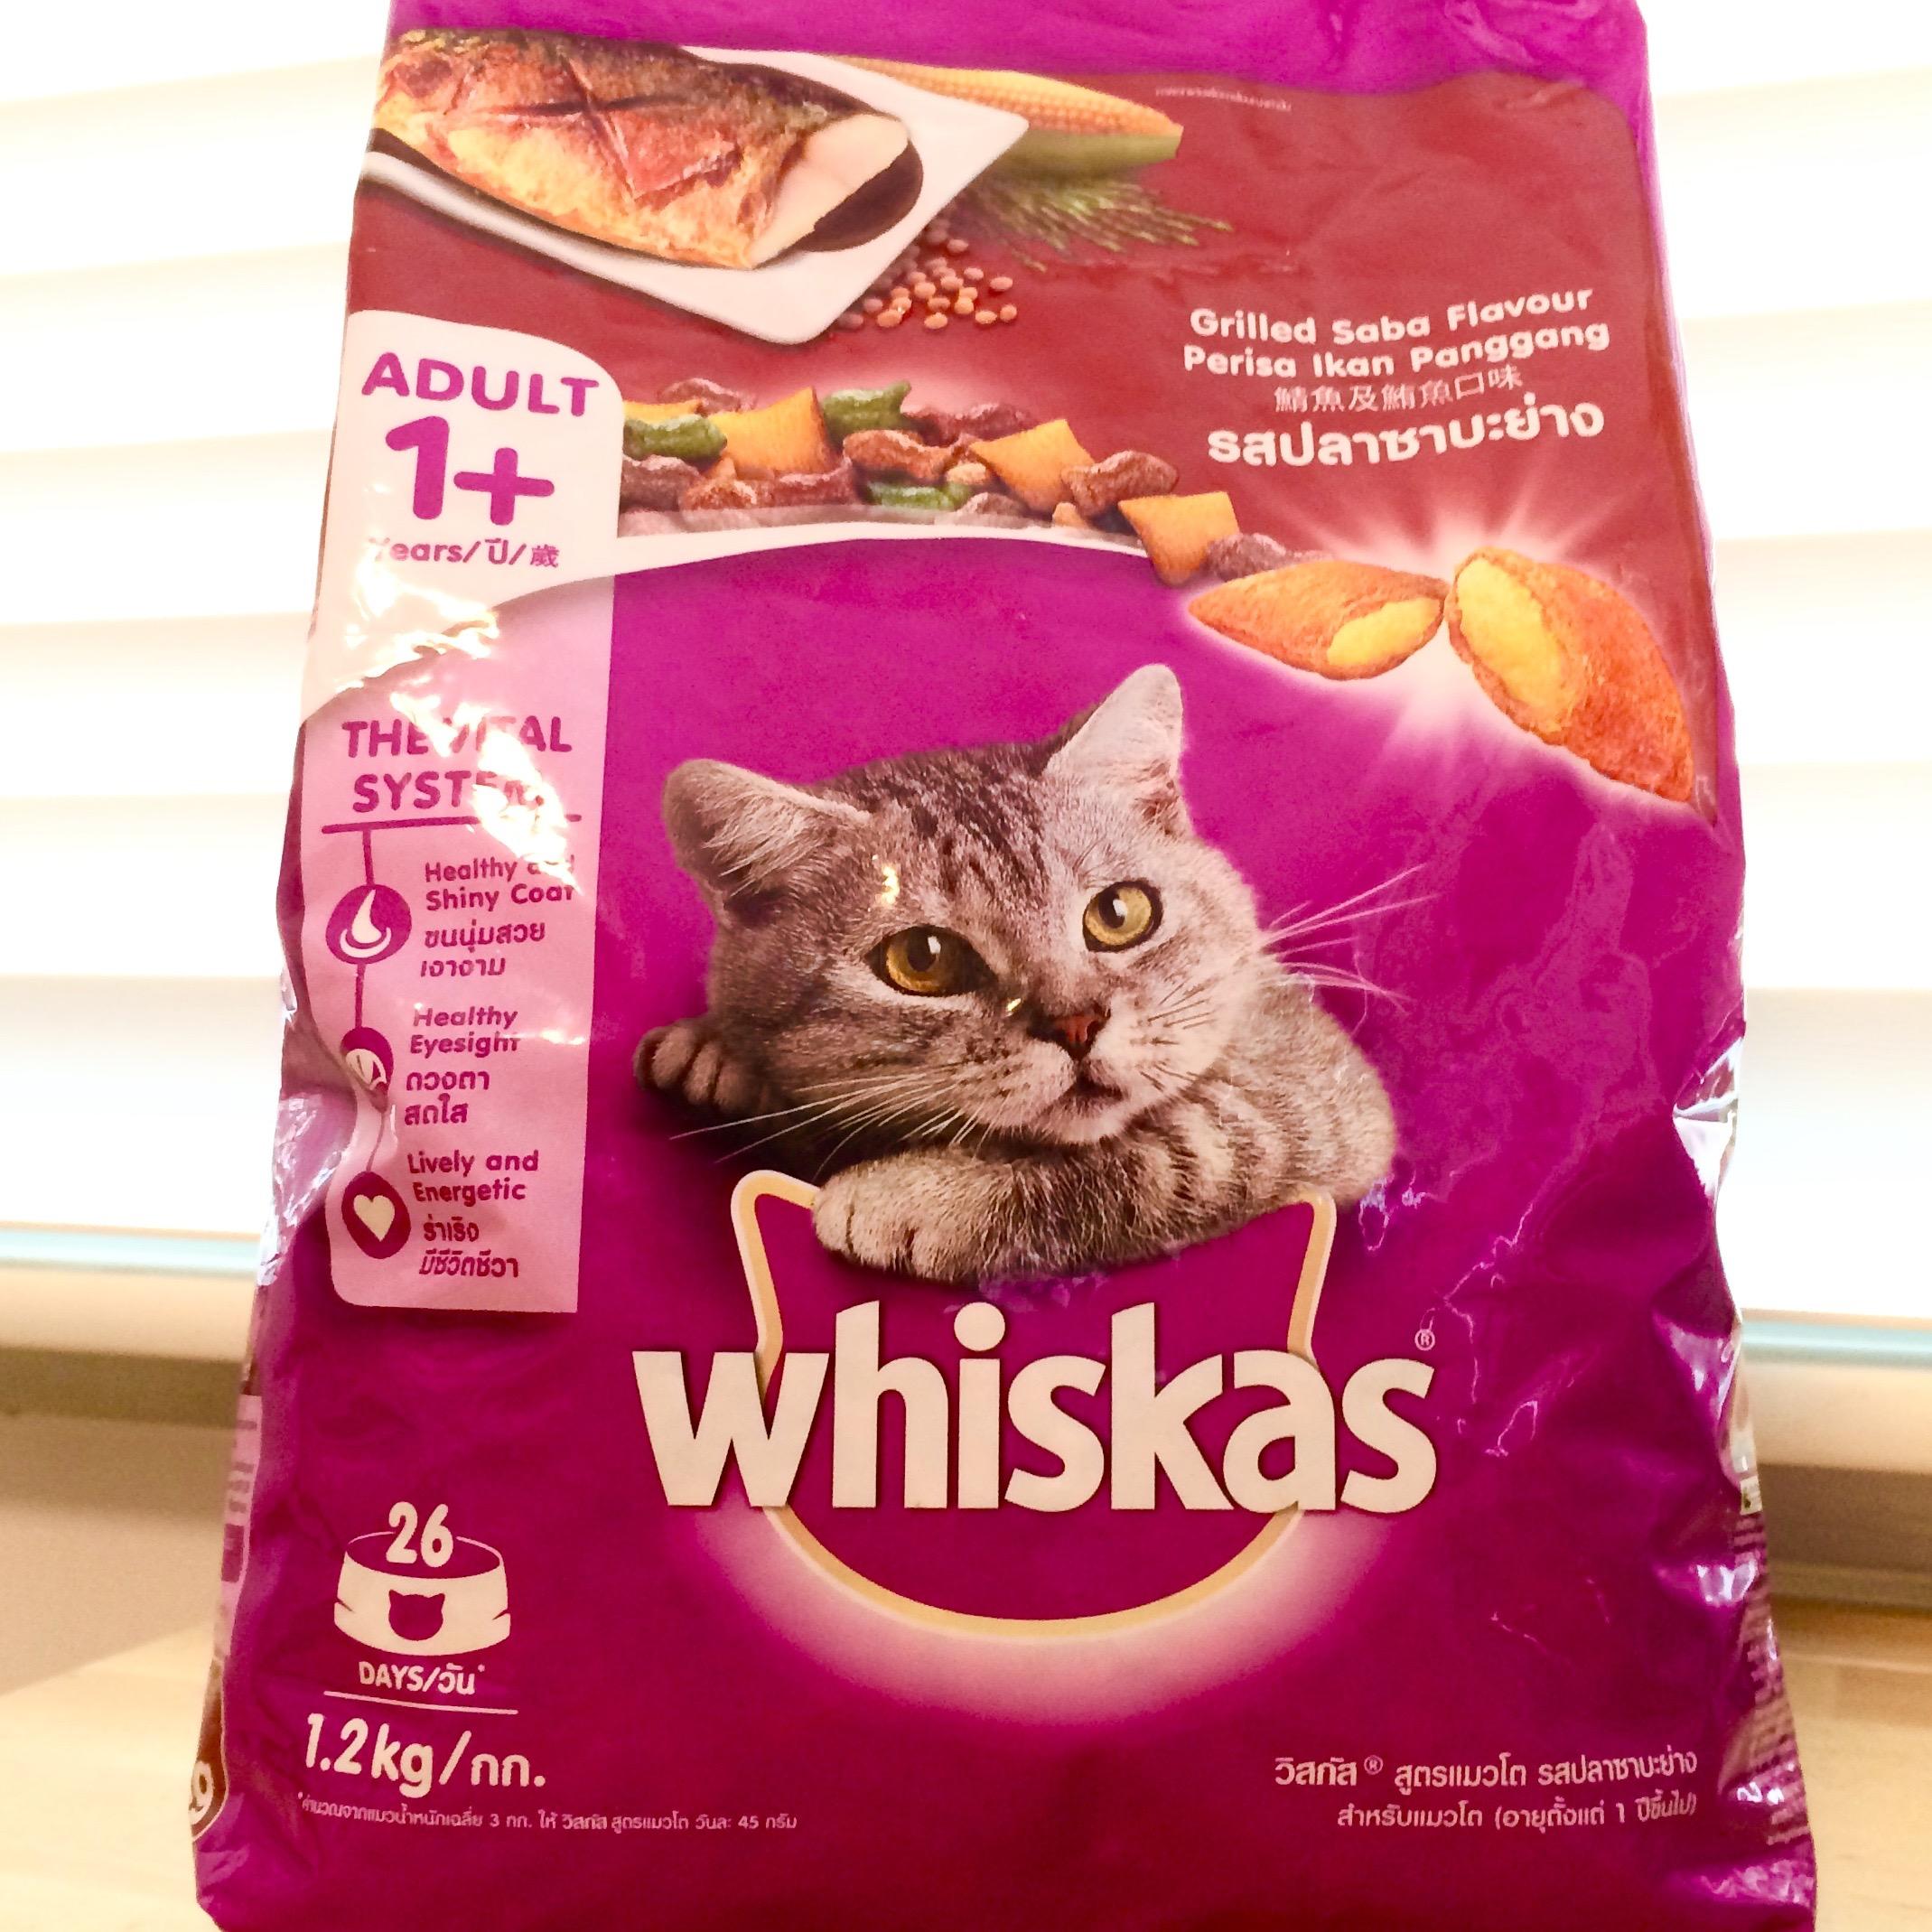 Whiskas Adult Grilled Saba 12kg Daftar Harga Terbaru Dan Terupdate Dry Makanan Kucing Kering Rasa Fussie Cat Wet Food Free Delivery Pet Supplies On Carousell